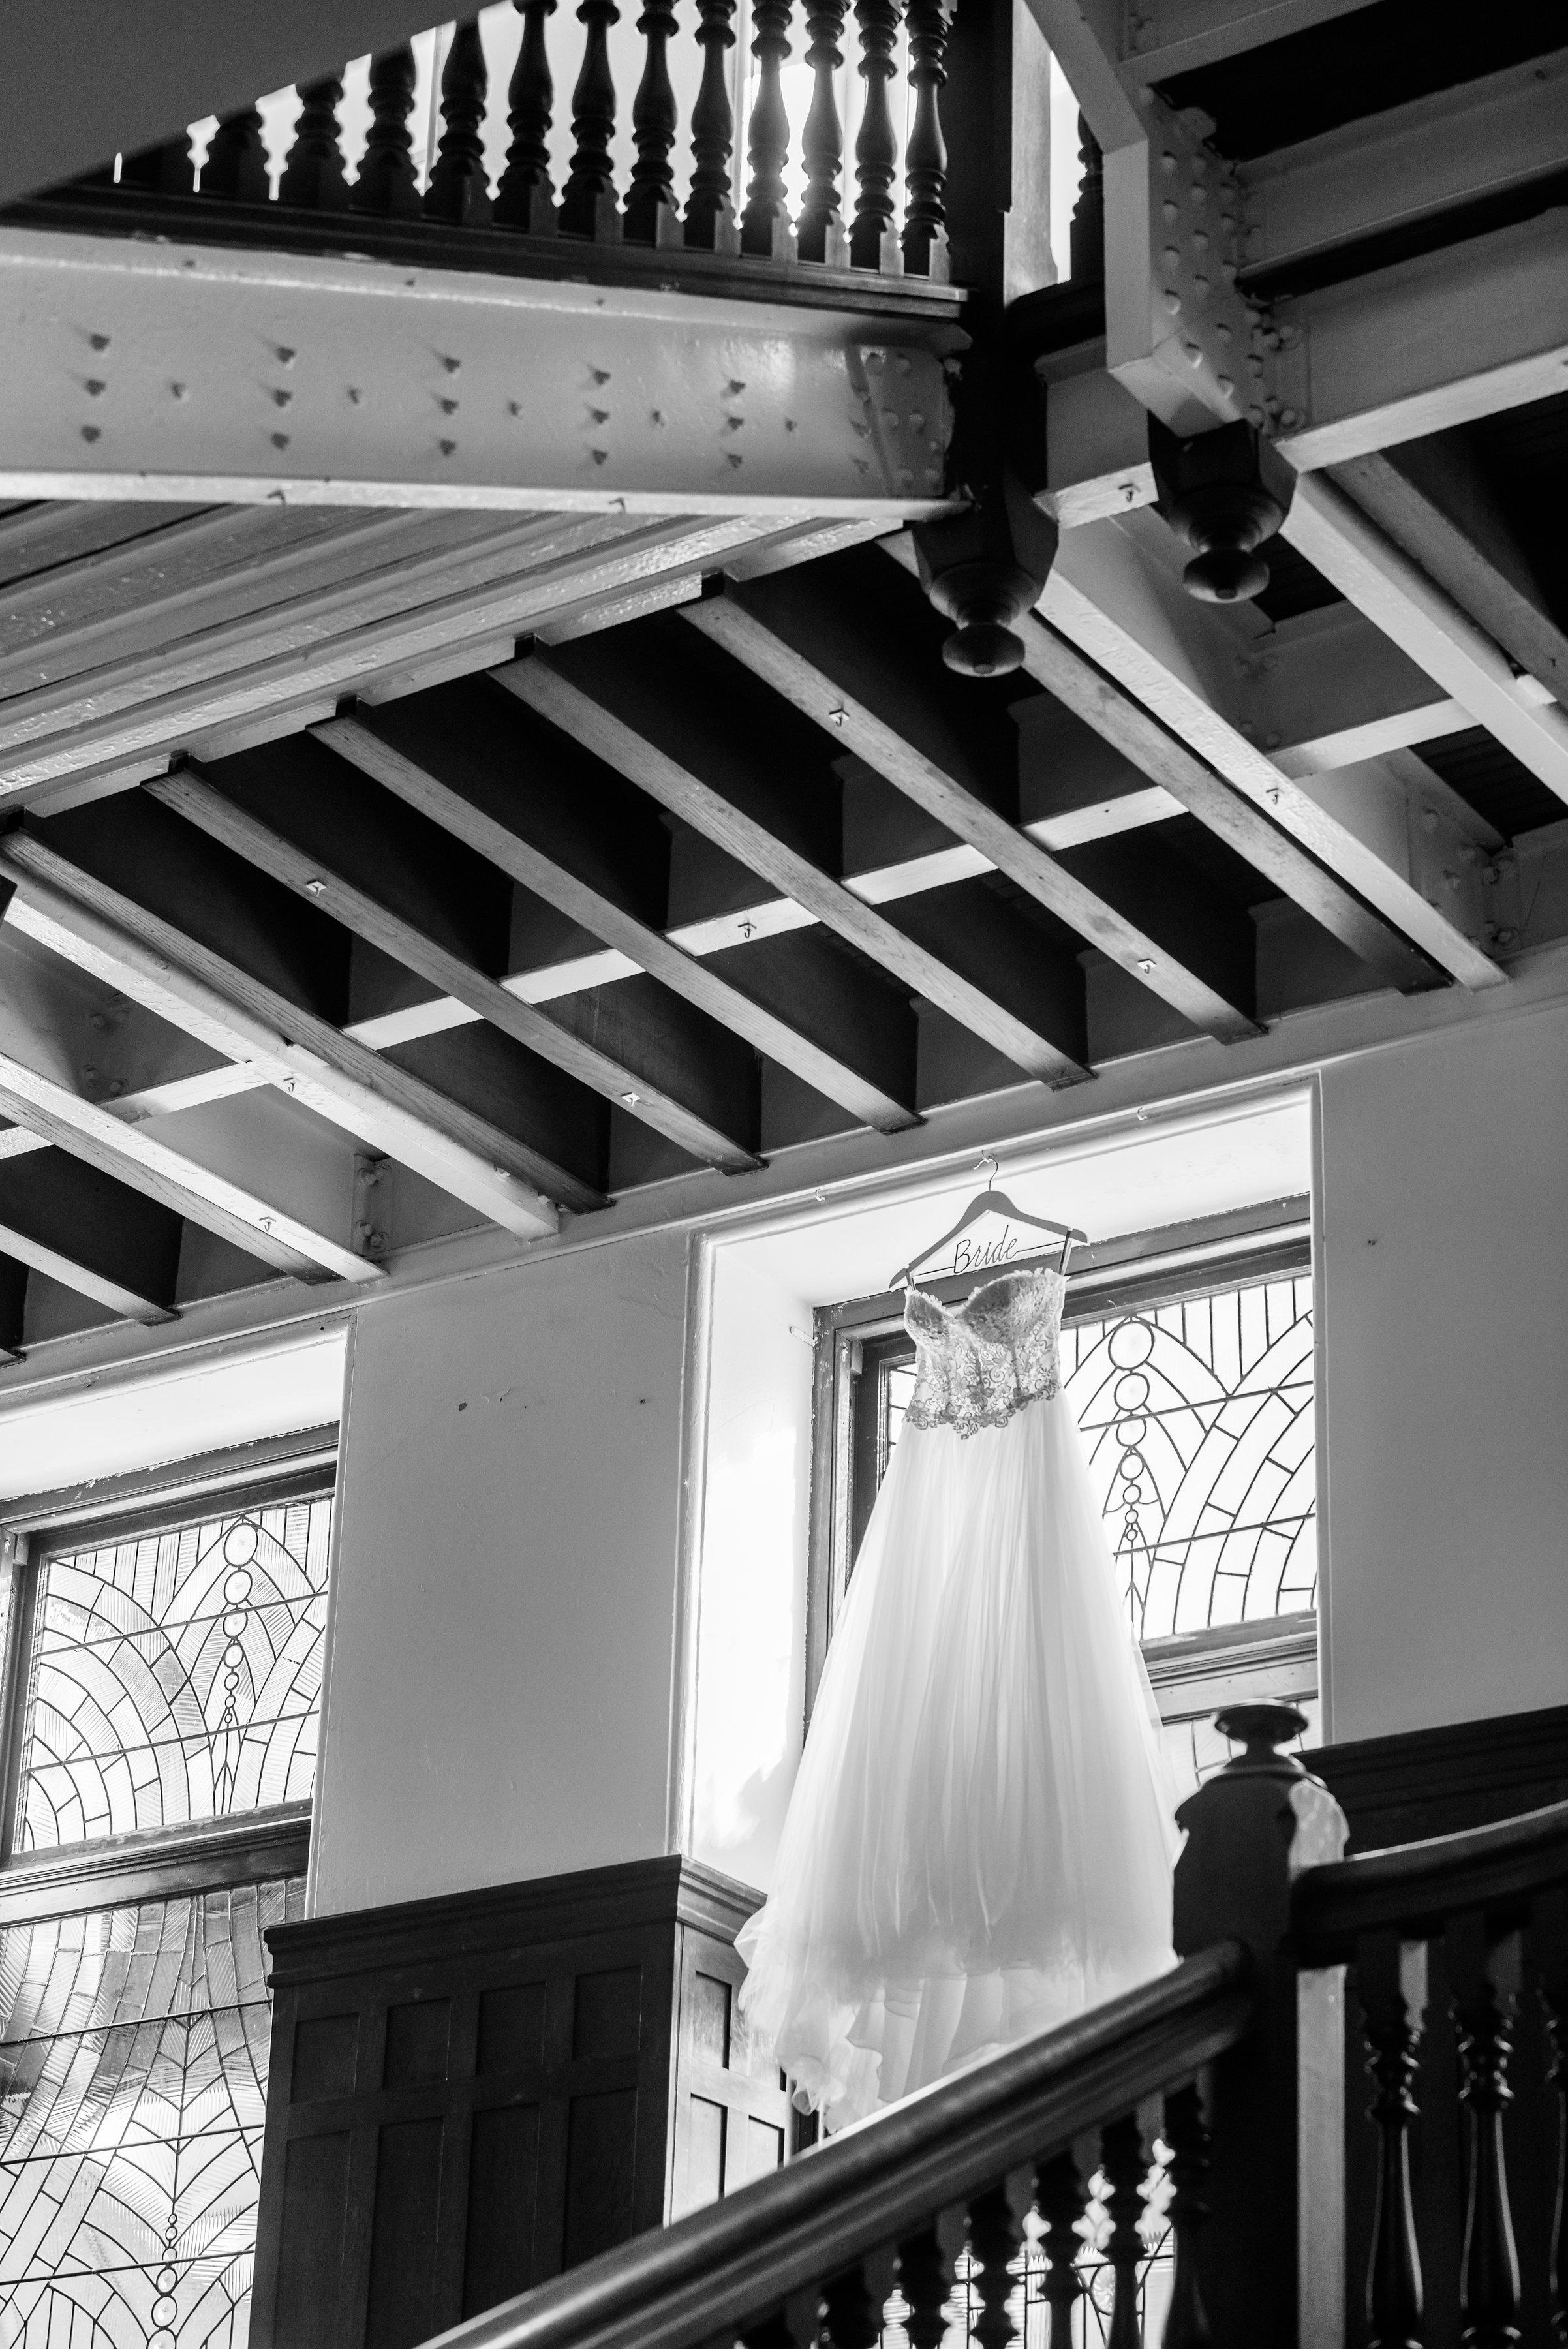 Baldwin-School-Wedding-Photographer-Event-Venue-Pennsylvania-Mainline-Andrea-Krout-Photography-1.jpg